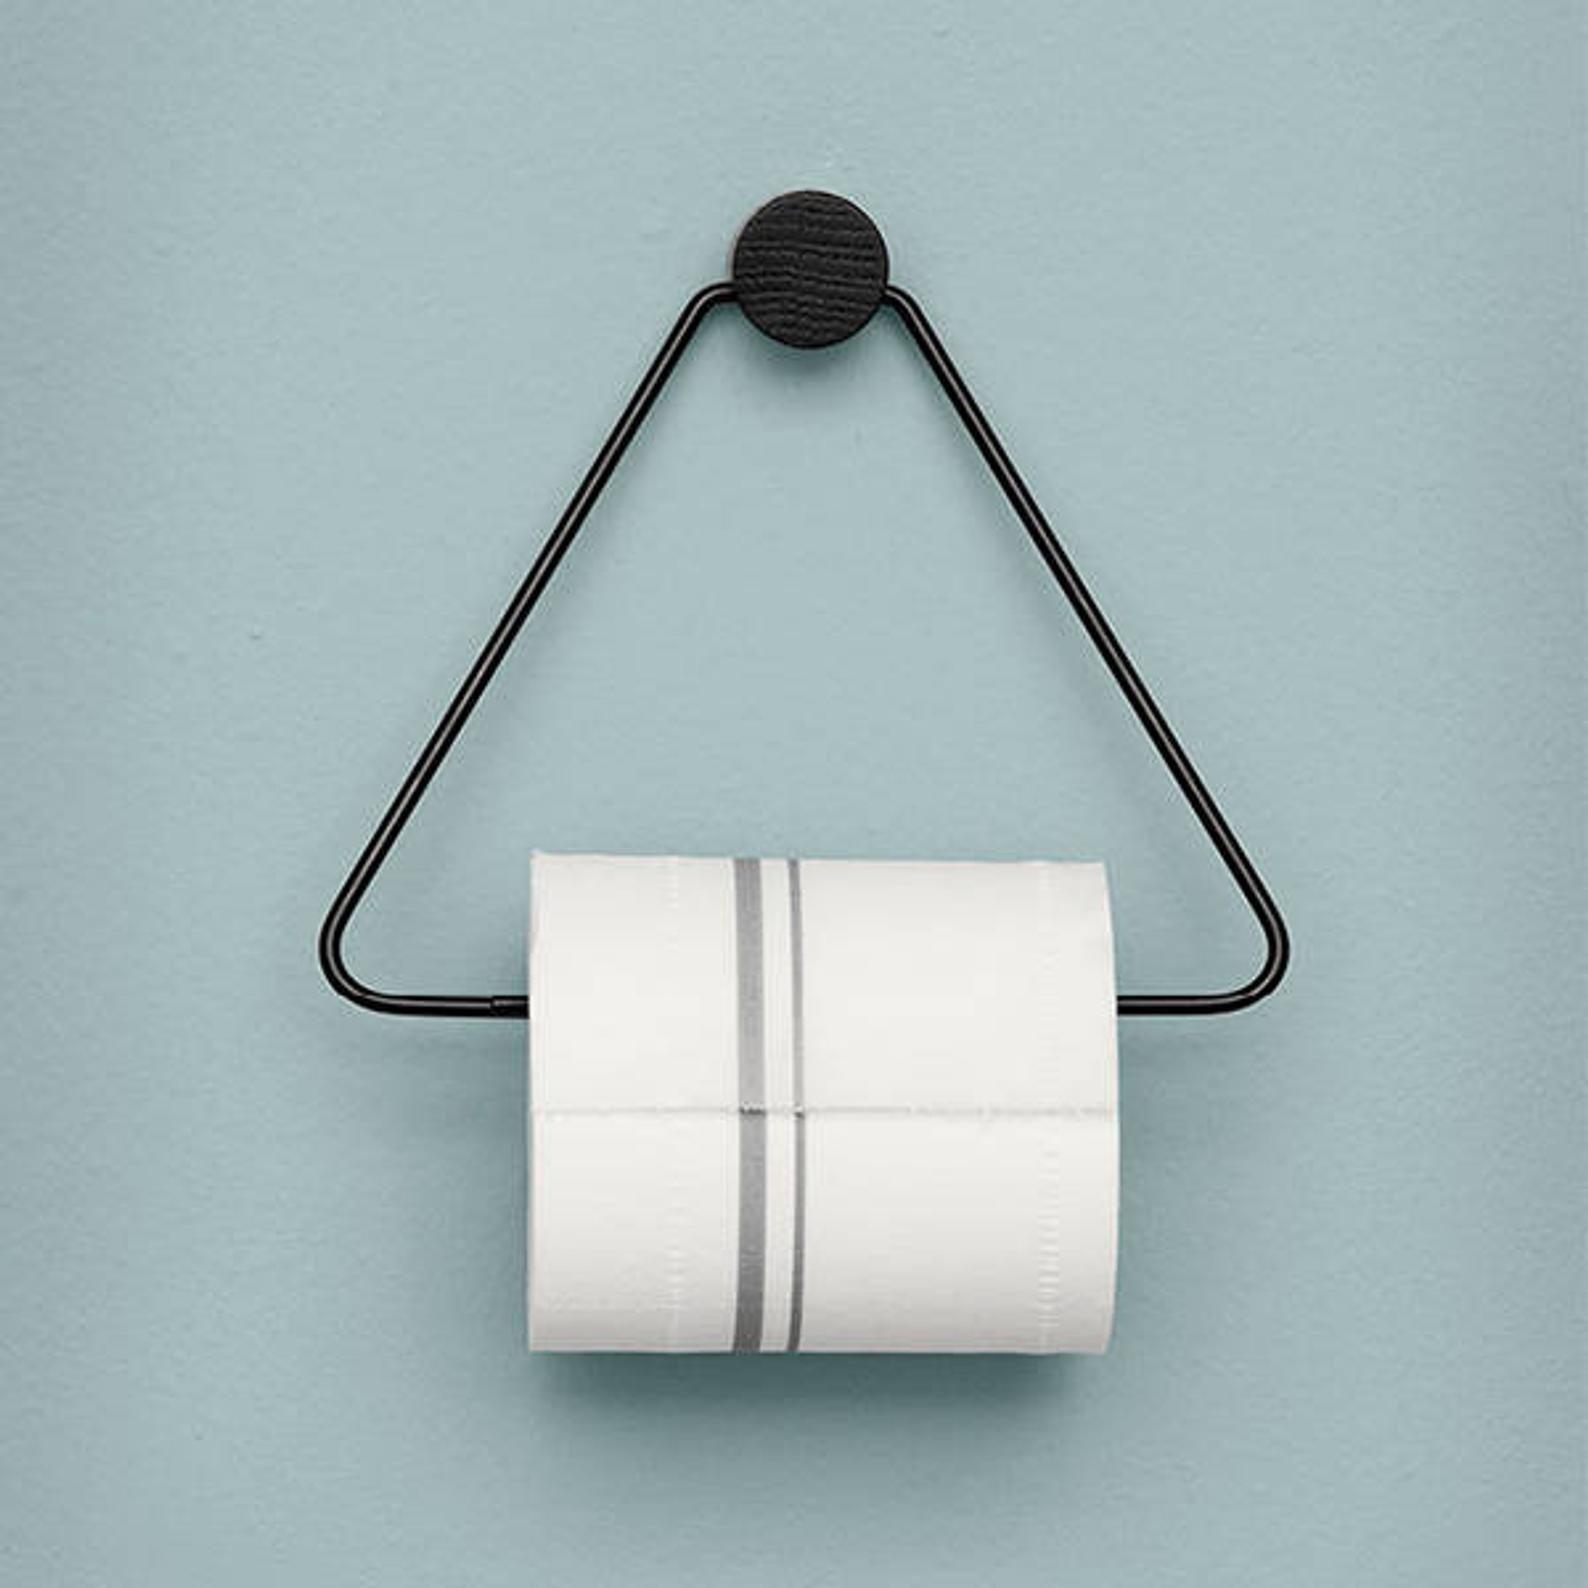 Nordic Design Bathroom Toilet Paper Holder Gold Scandinavian Towel Hanger Stainless Steel Home Bathroom Decoration In 2020 Black Toilet Paper Holder Bathroom Toilet Paper Holders Toilet Paper Holder Gold